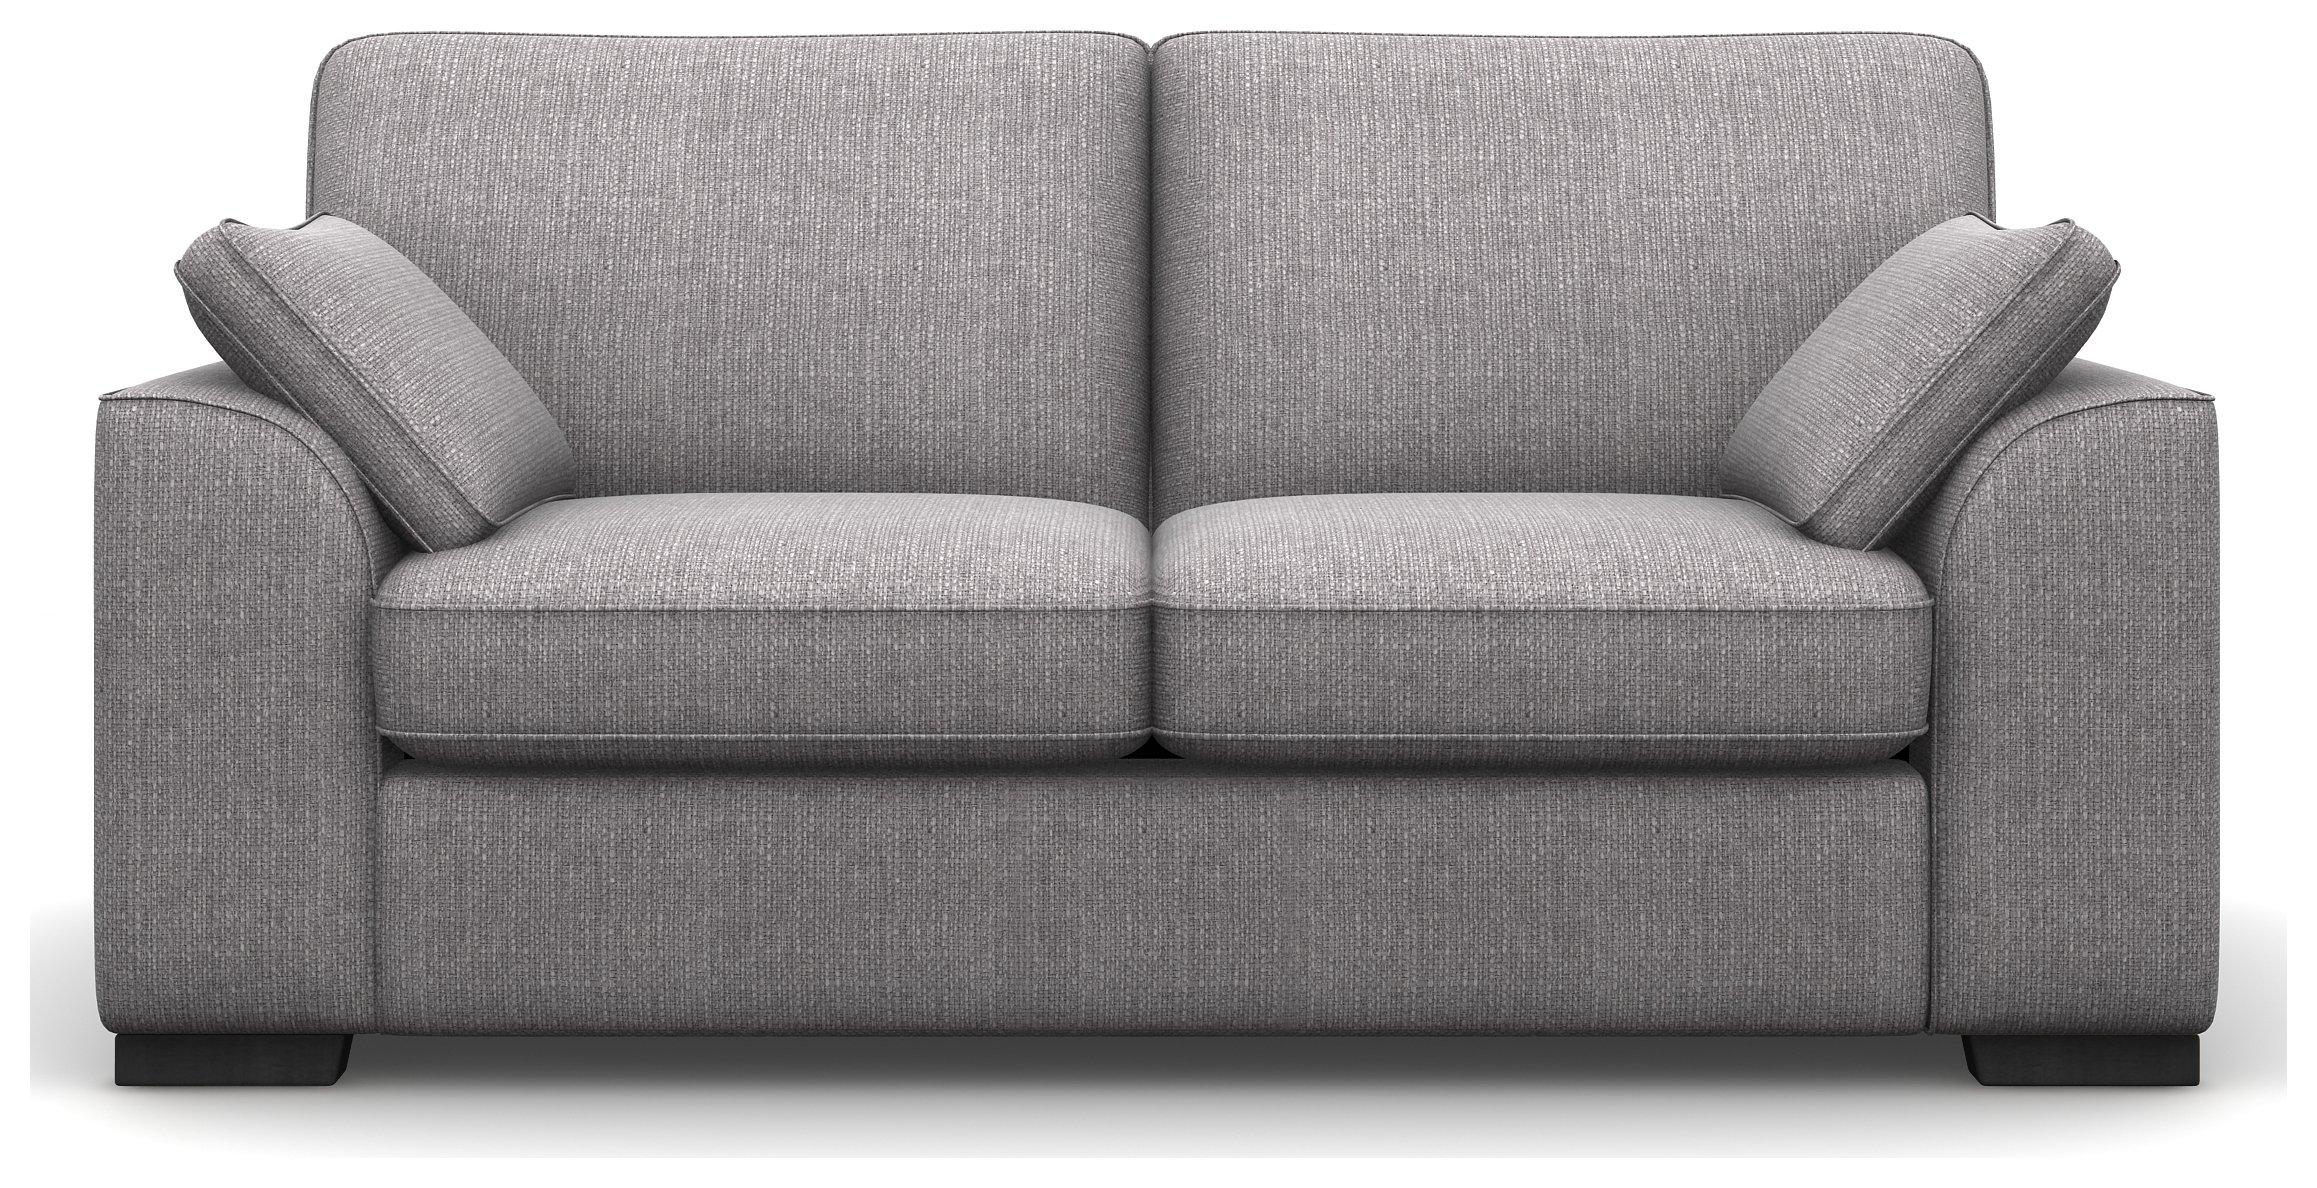 Heart of House Lincoln 2 Seater Fabric Sofa - Ash + Black Legs